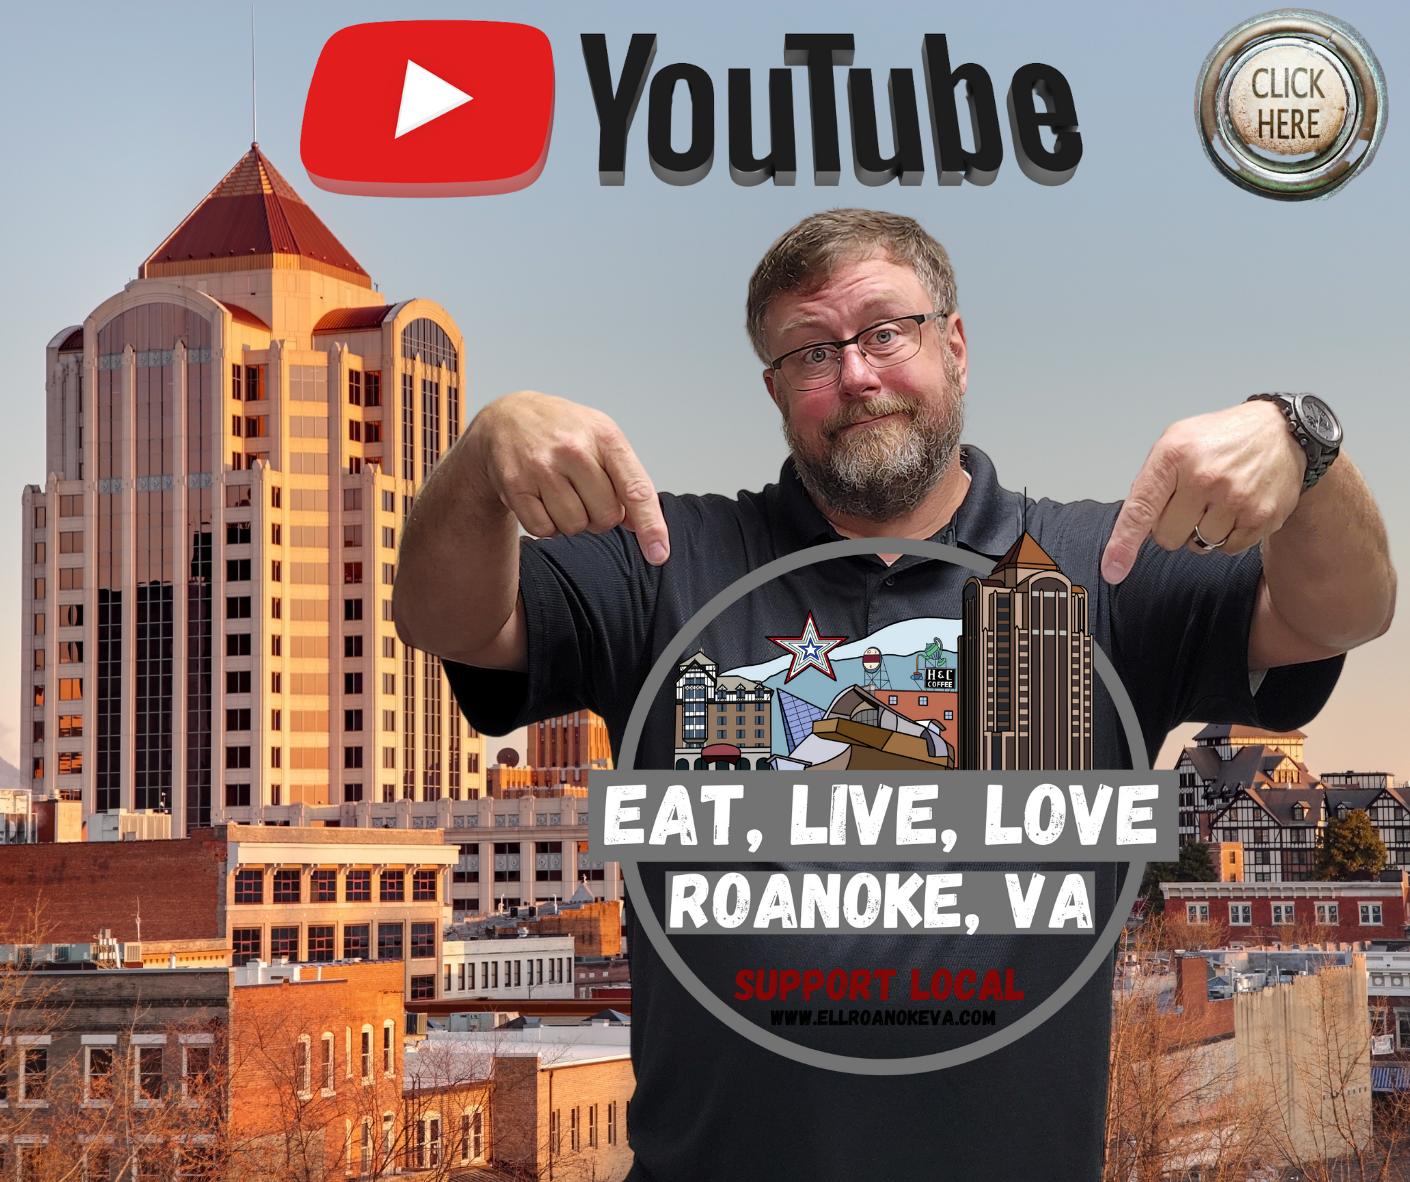 Eat, Live, Love Roanoke VA